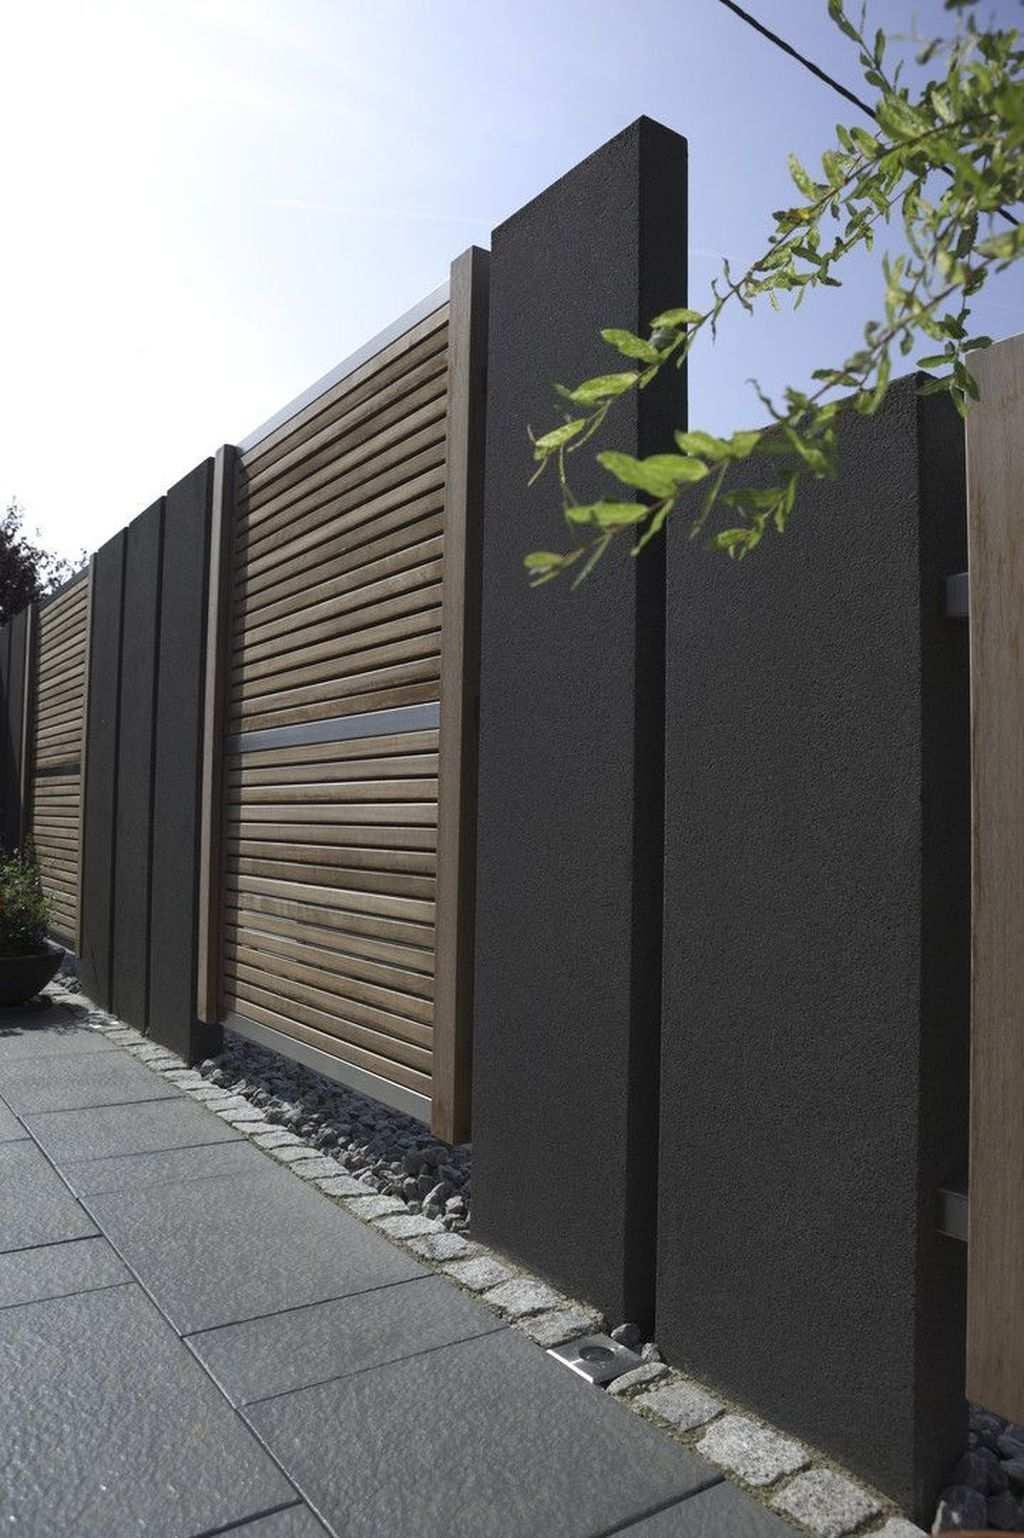 31 Amazing Minimalist Fence Design Ideas For Your Front Yard Homepiez Fence Design Modern Fence Design Modern Fence